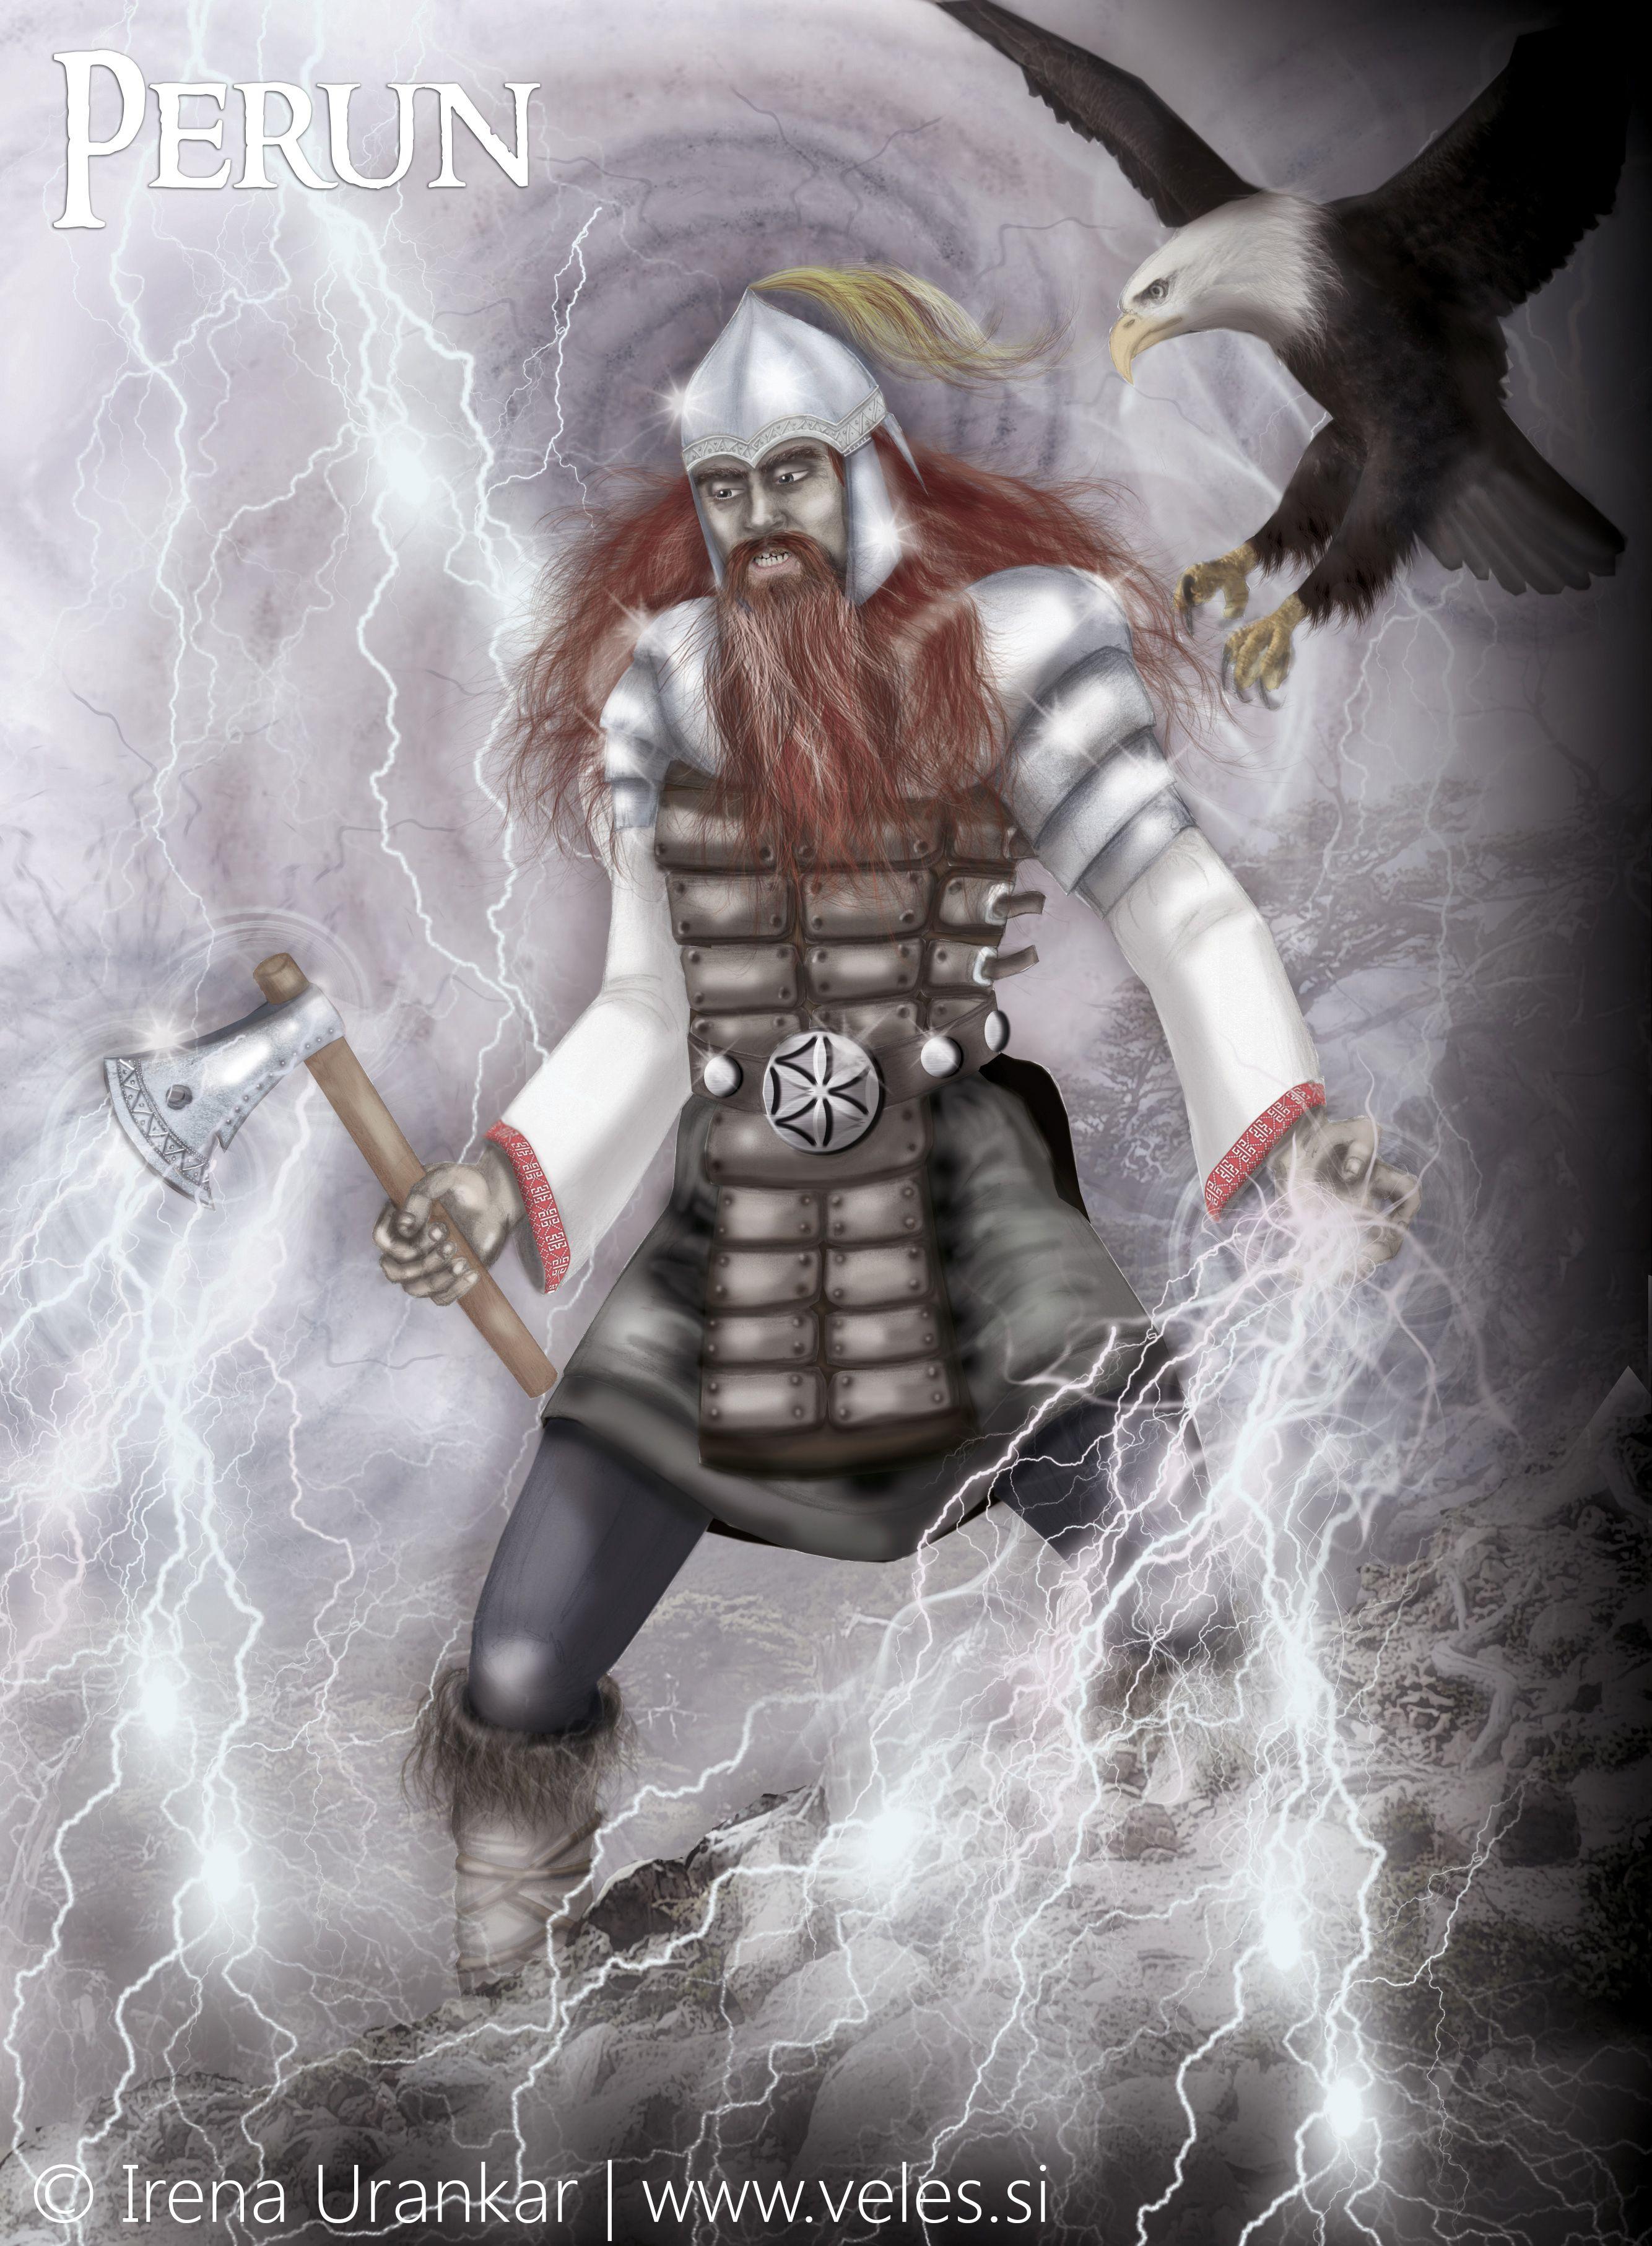 Perun The God Of Justice The Thunder God The Sky Manager He Throws His Thunderbolt To The Ground And M Russian Mythology Mythology Books Slavic Mythology